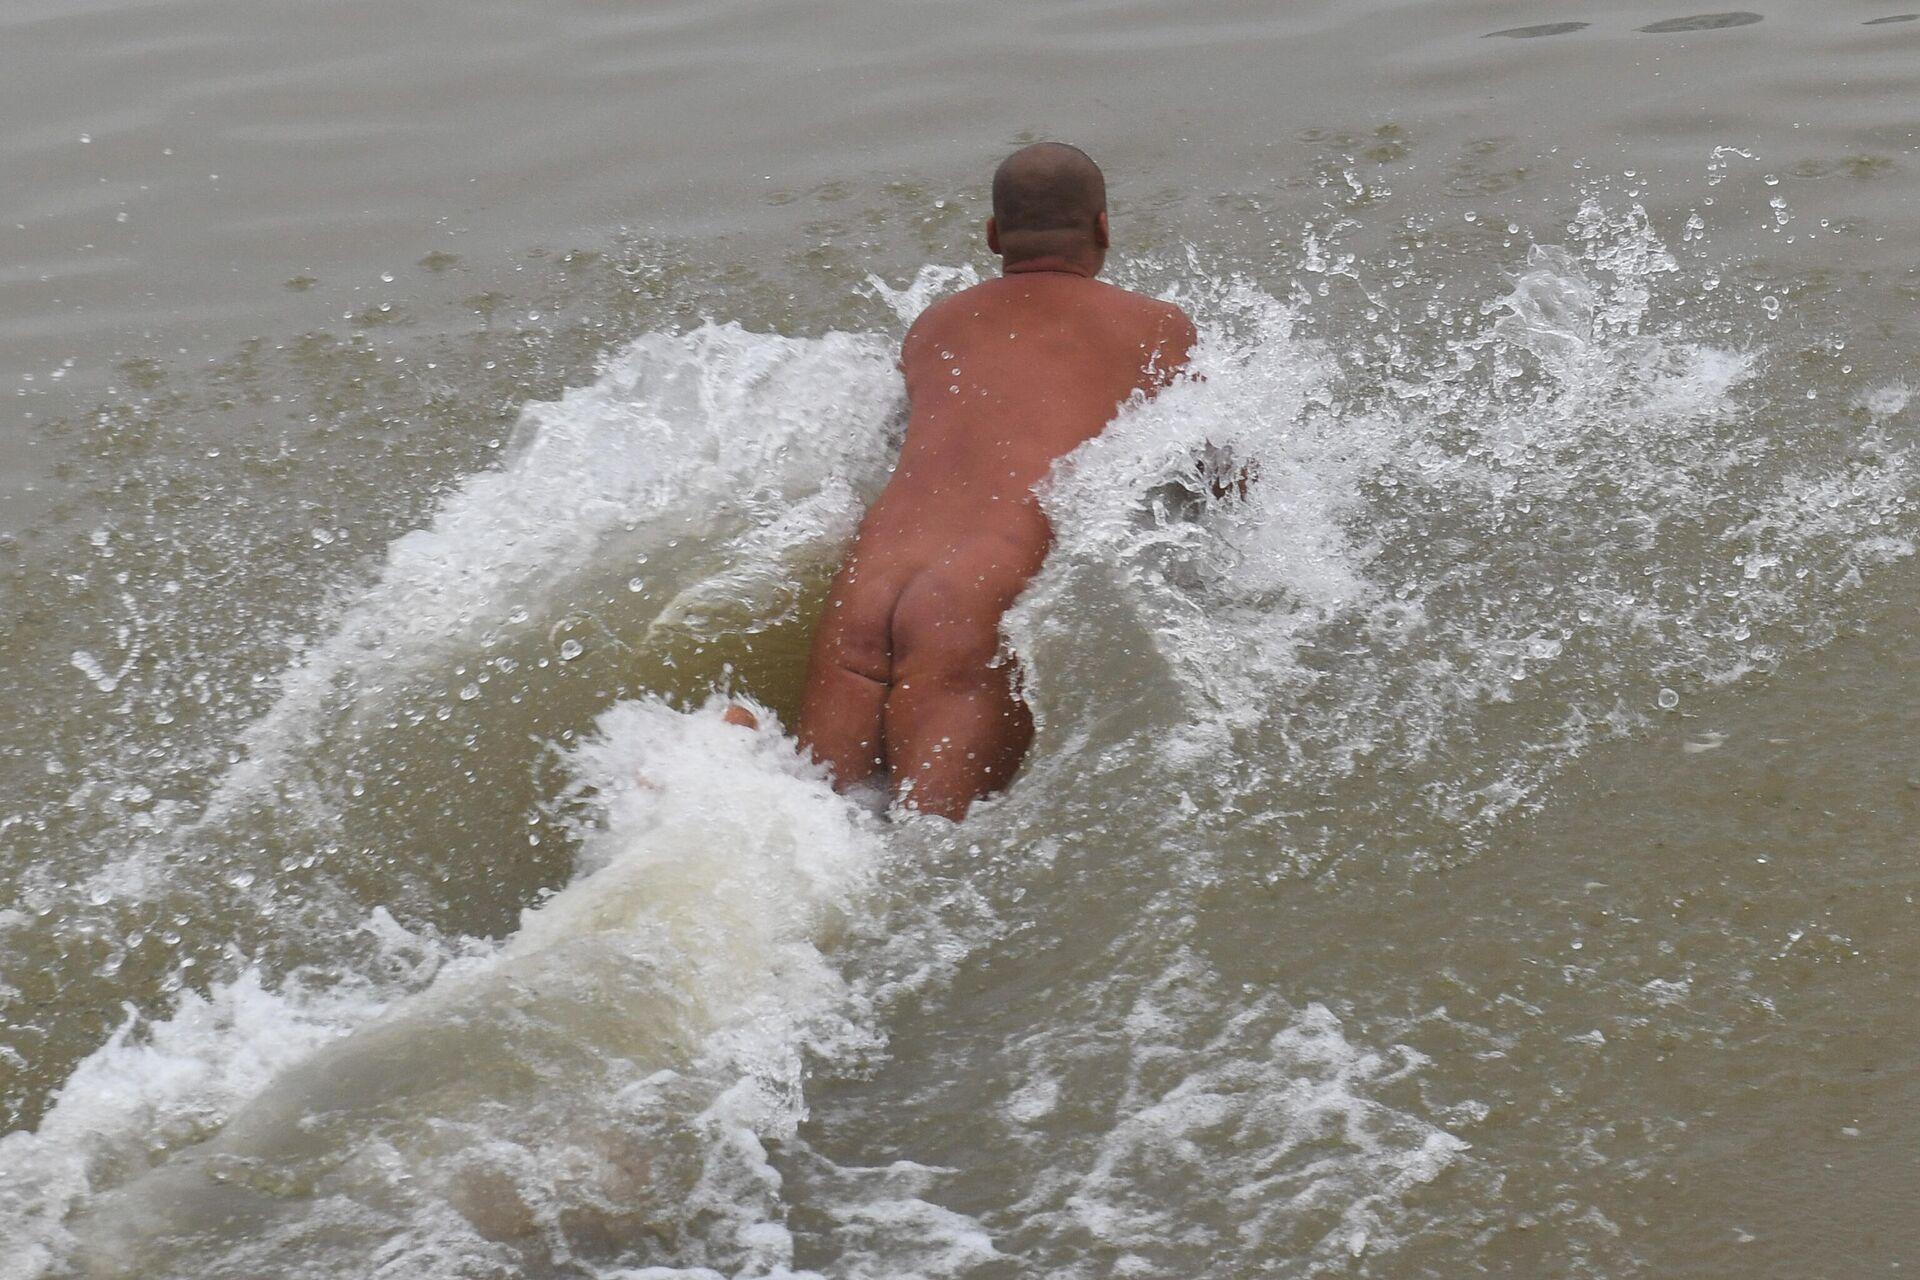 Nudista sumergiéndose en el agua en Hanoi (Vietnam) - Sputnik Mundo, 1920, 19.08.2021